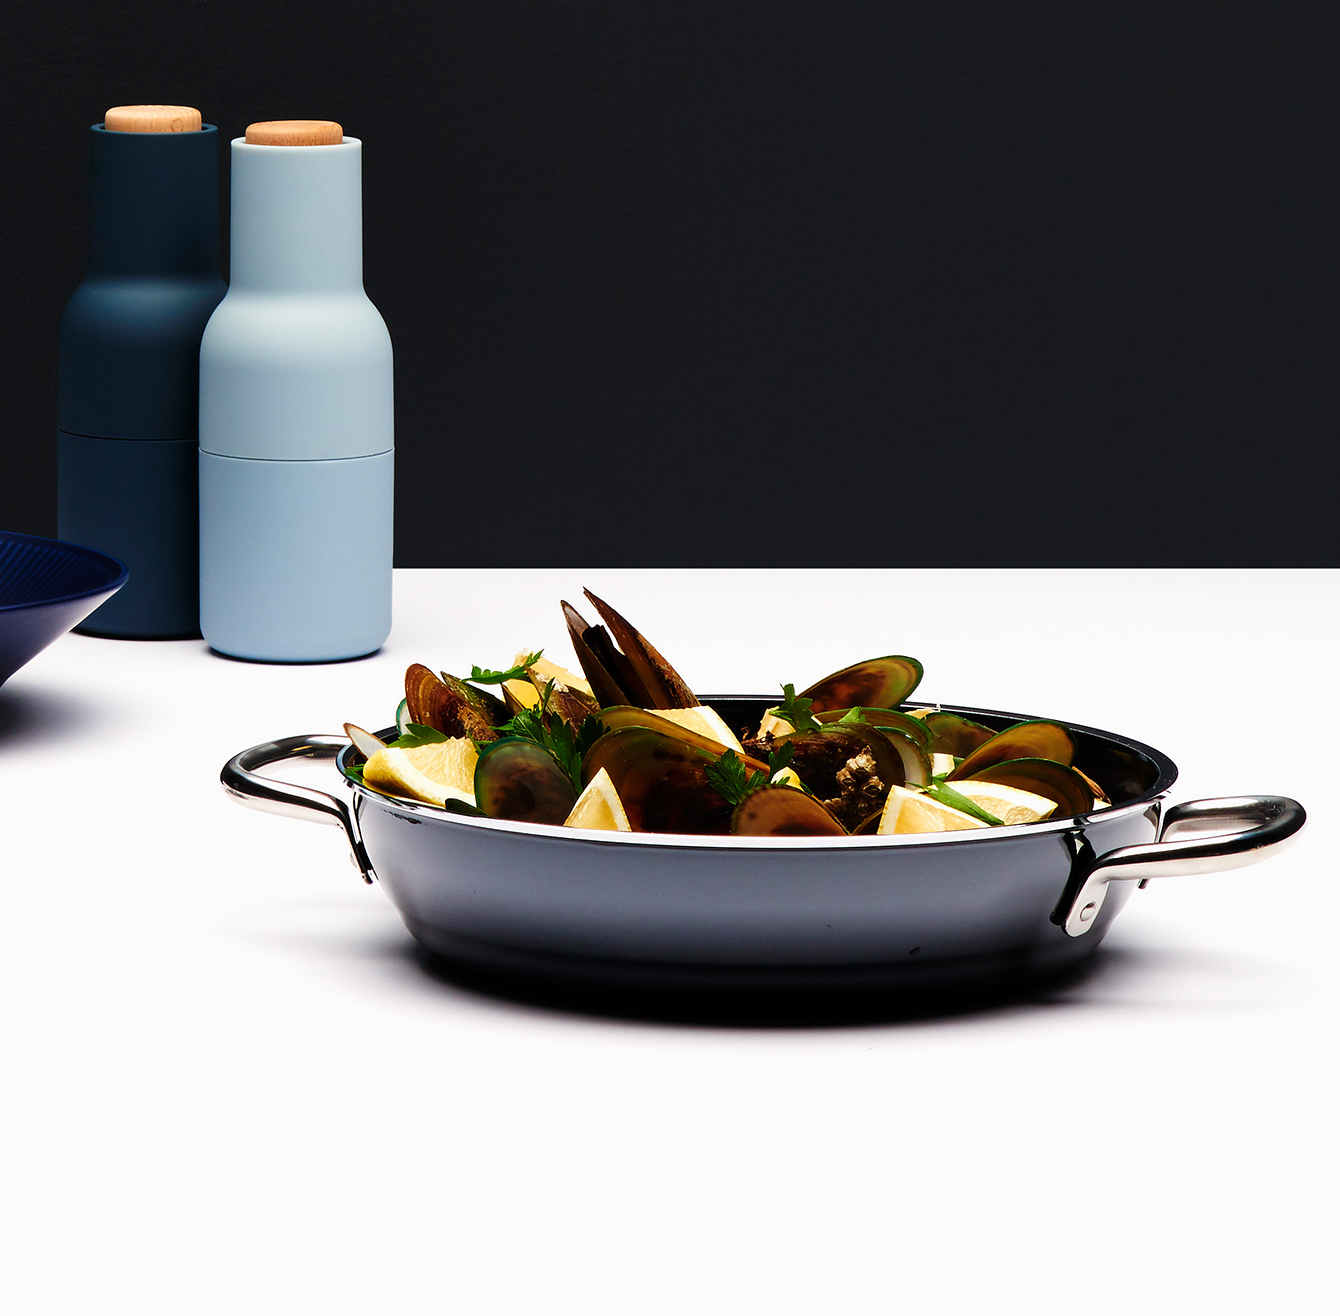 Amazon.it: Idee regalo in Cucina